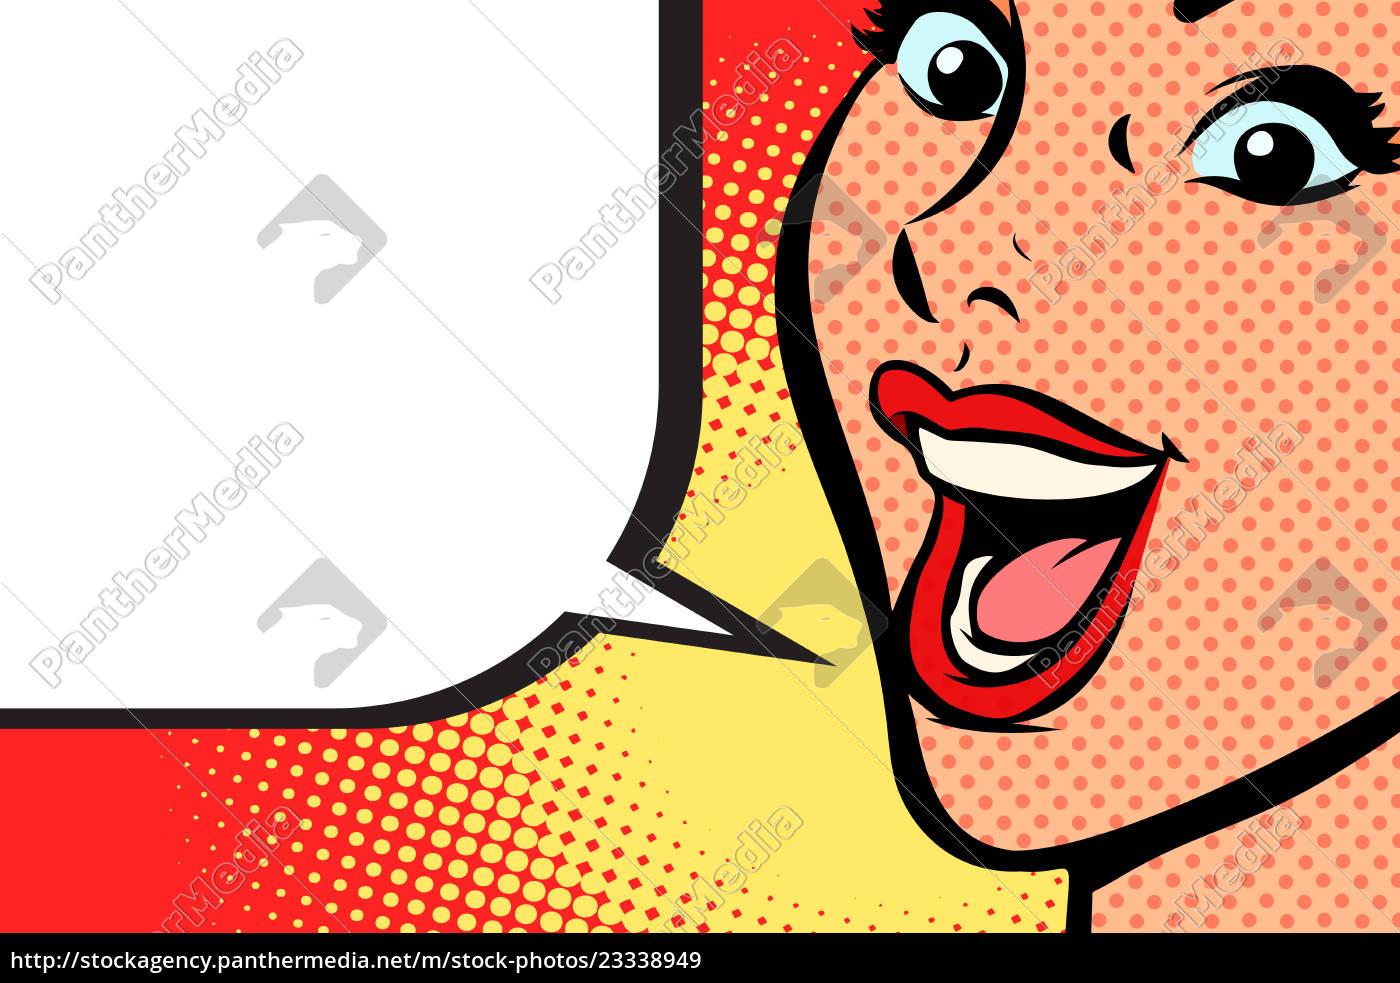 Close Up Pop Art Woman Face Smile Stock Photo 23338949 Panthermedia Stock Agency